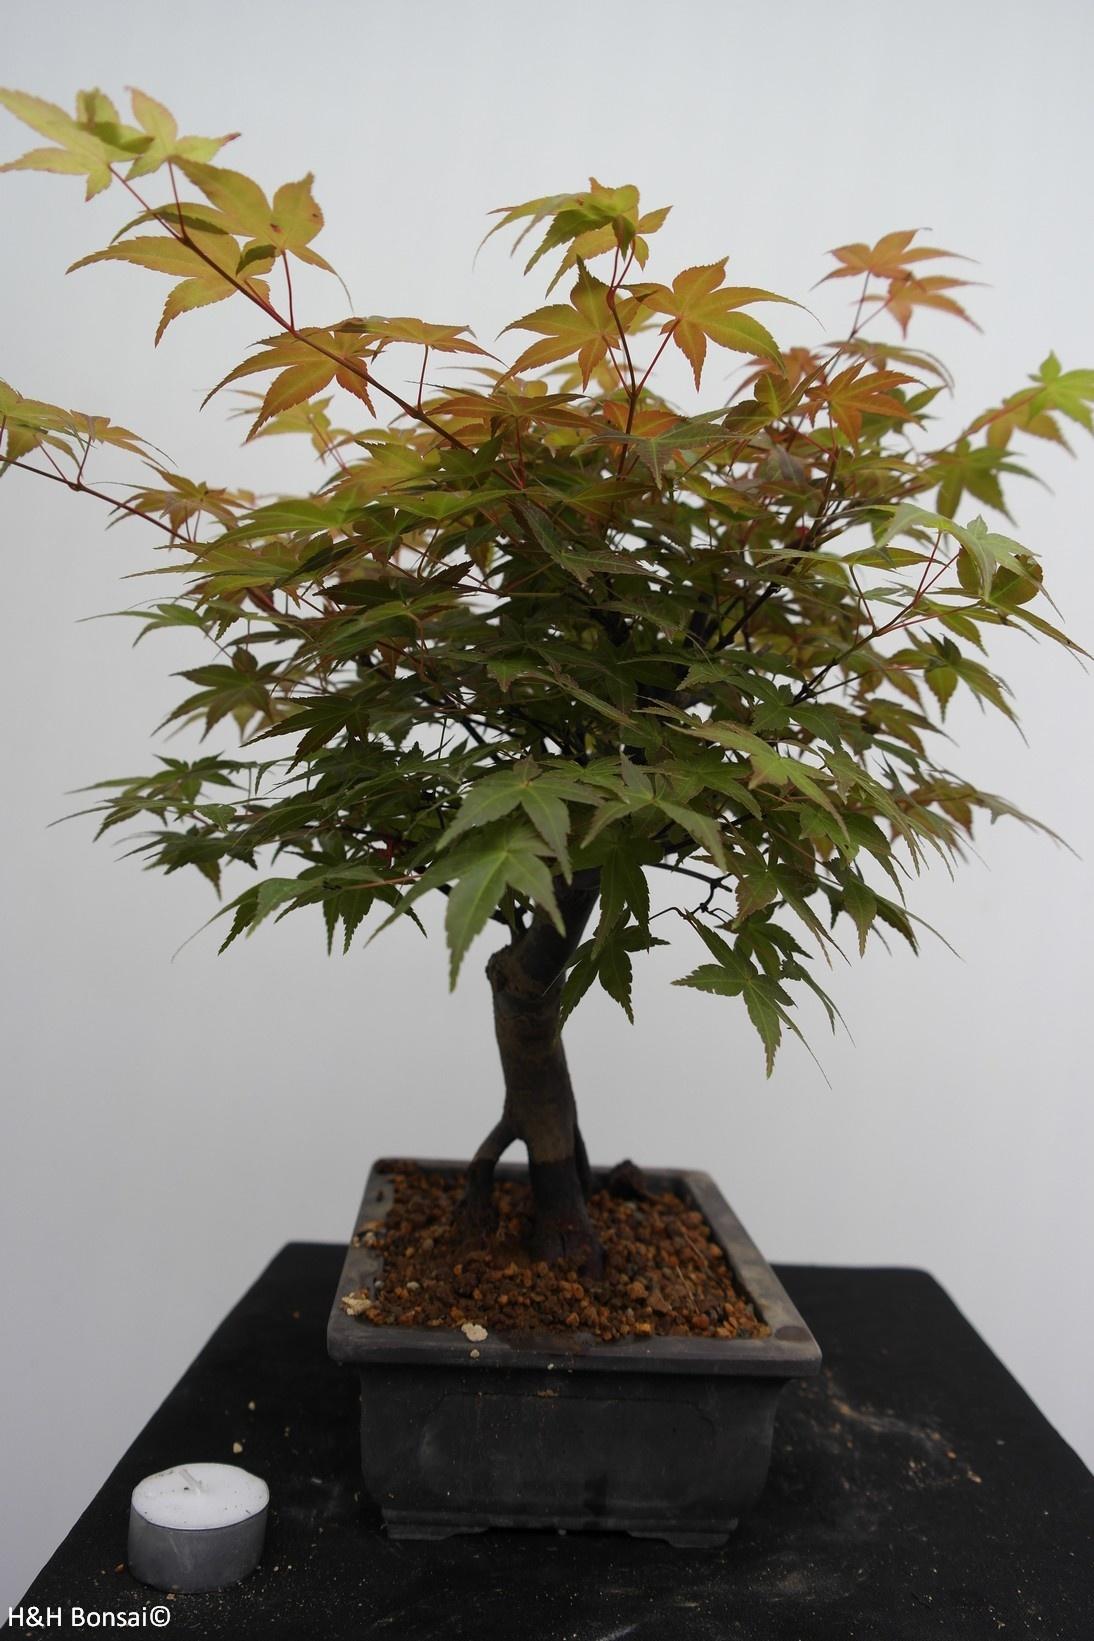 Bonsai Jap. Fächerahorn, Acer palmatum, nr. 7651